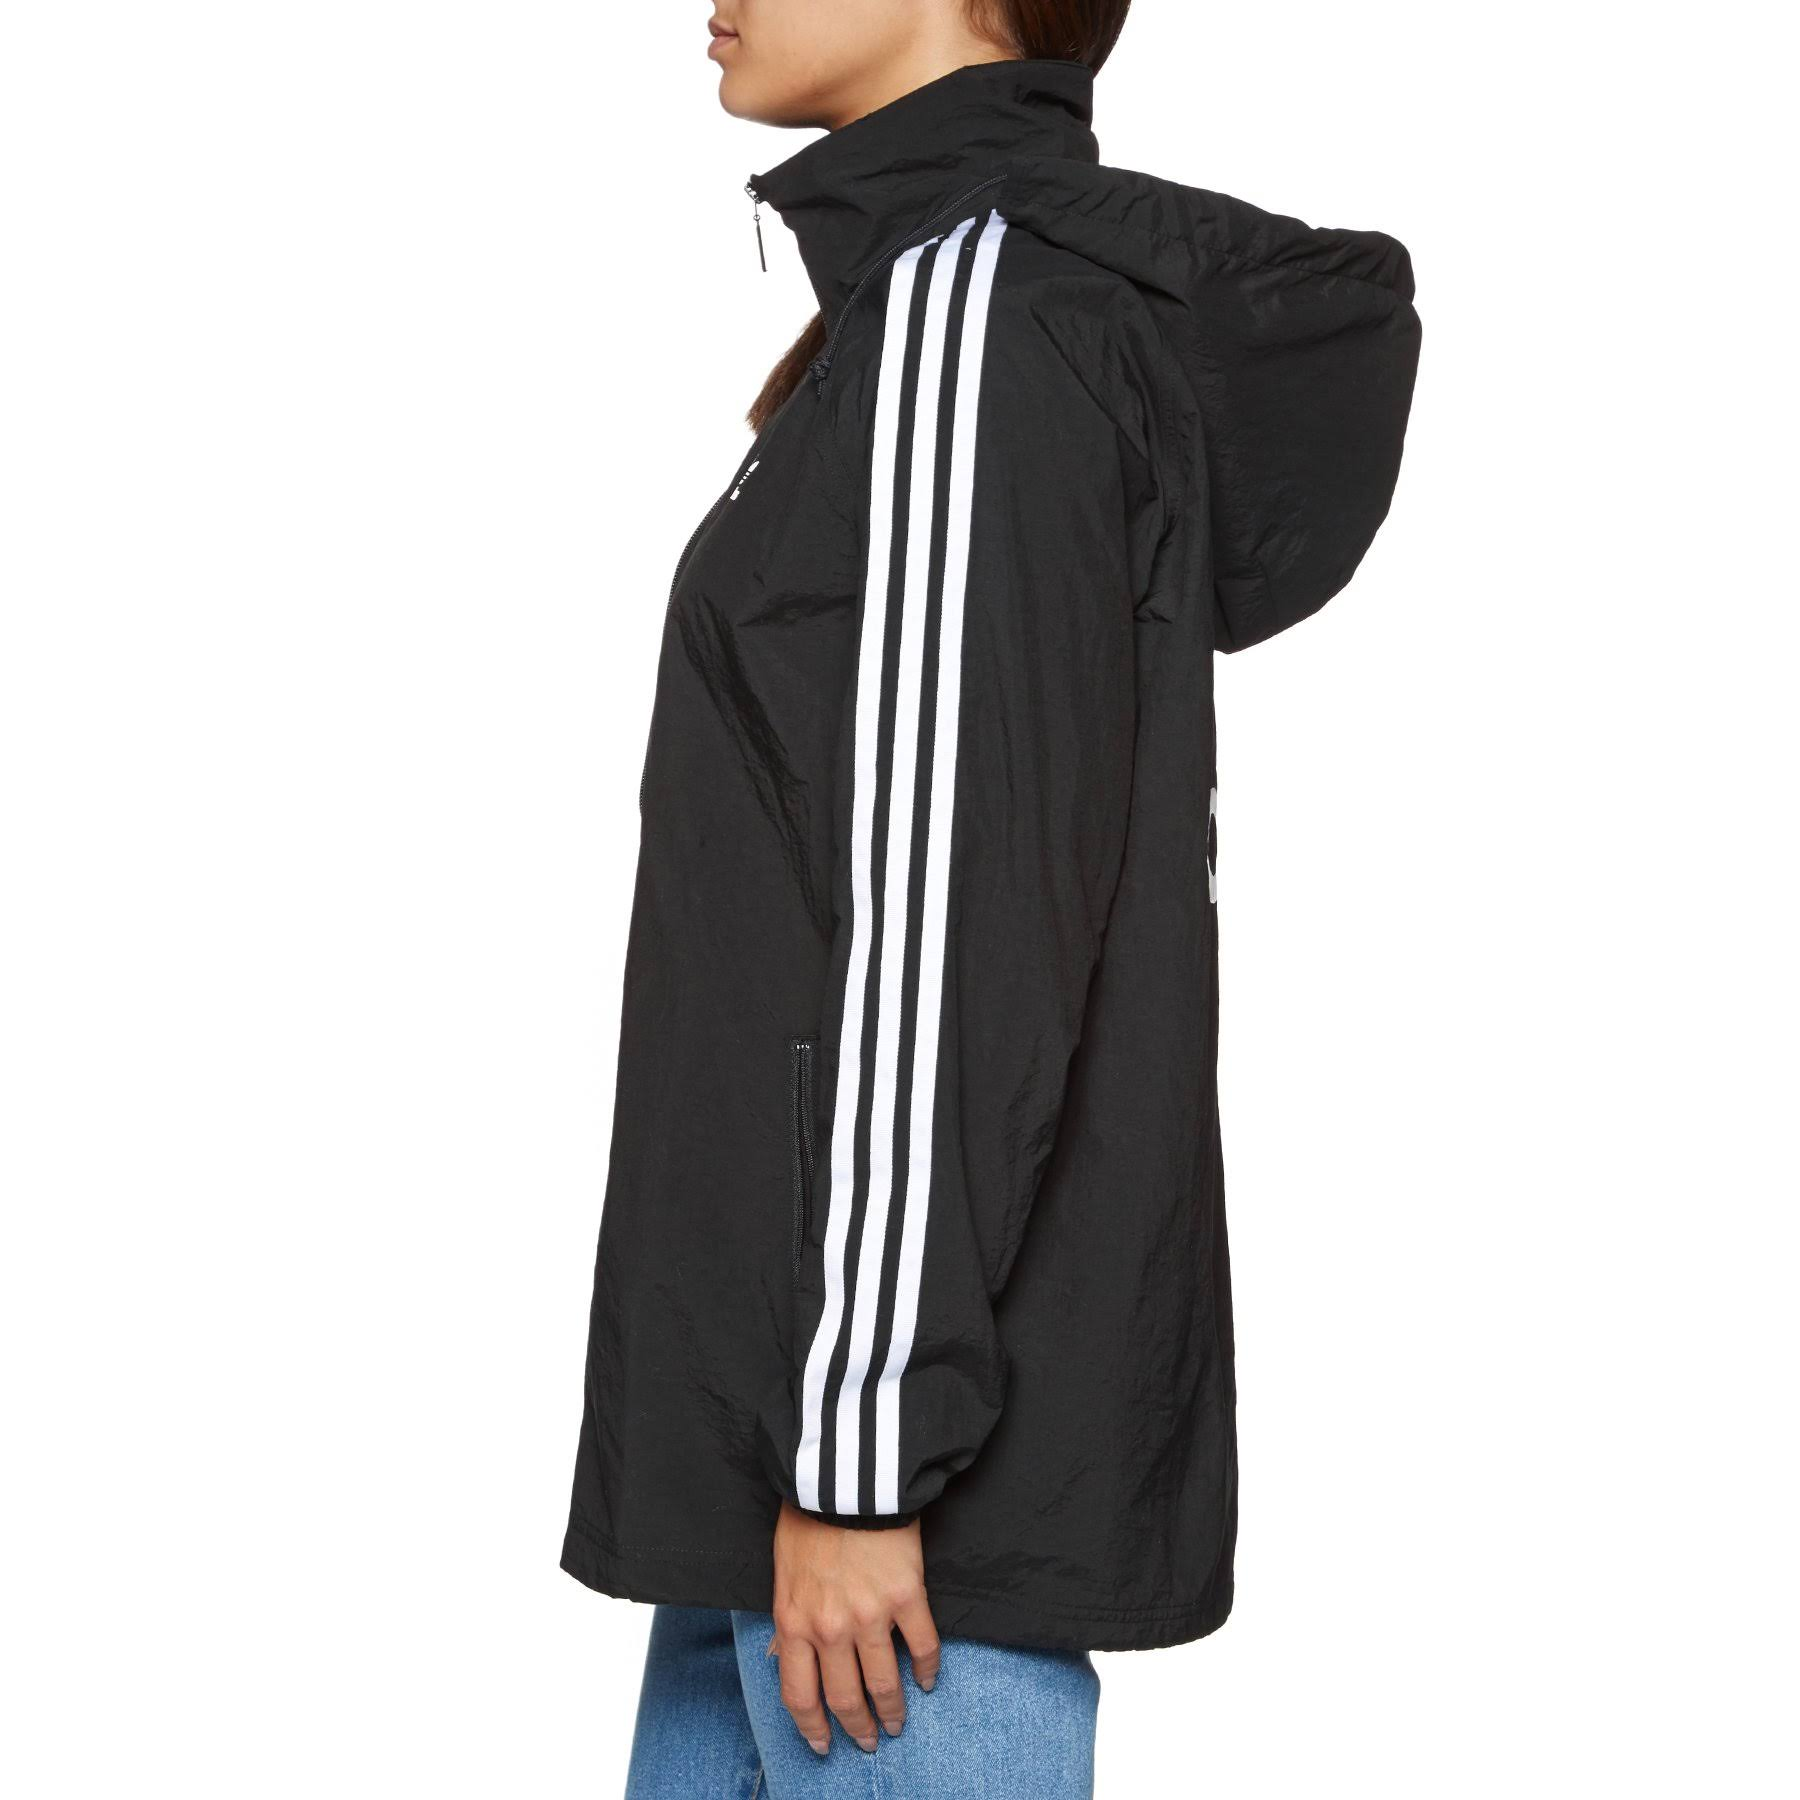 Stadium Blanco Jd Sports Adidas Black Ce5604 Jacket Negro Para Originals Mujer Iqqw57xH